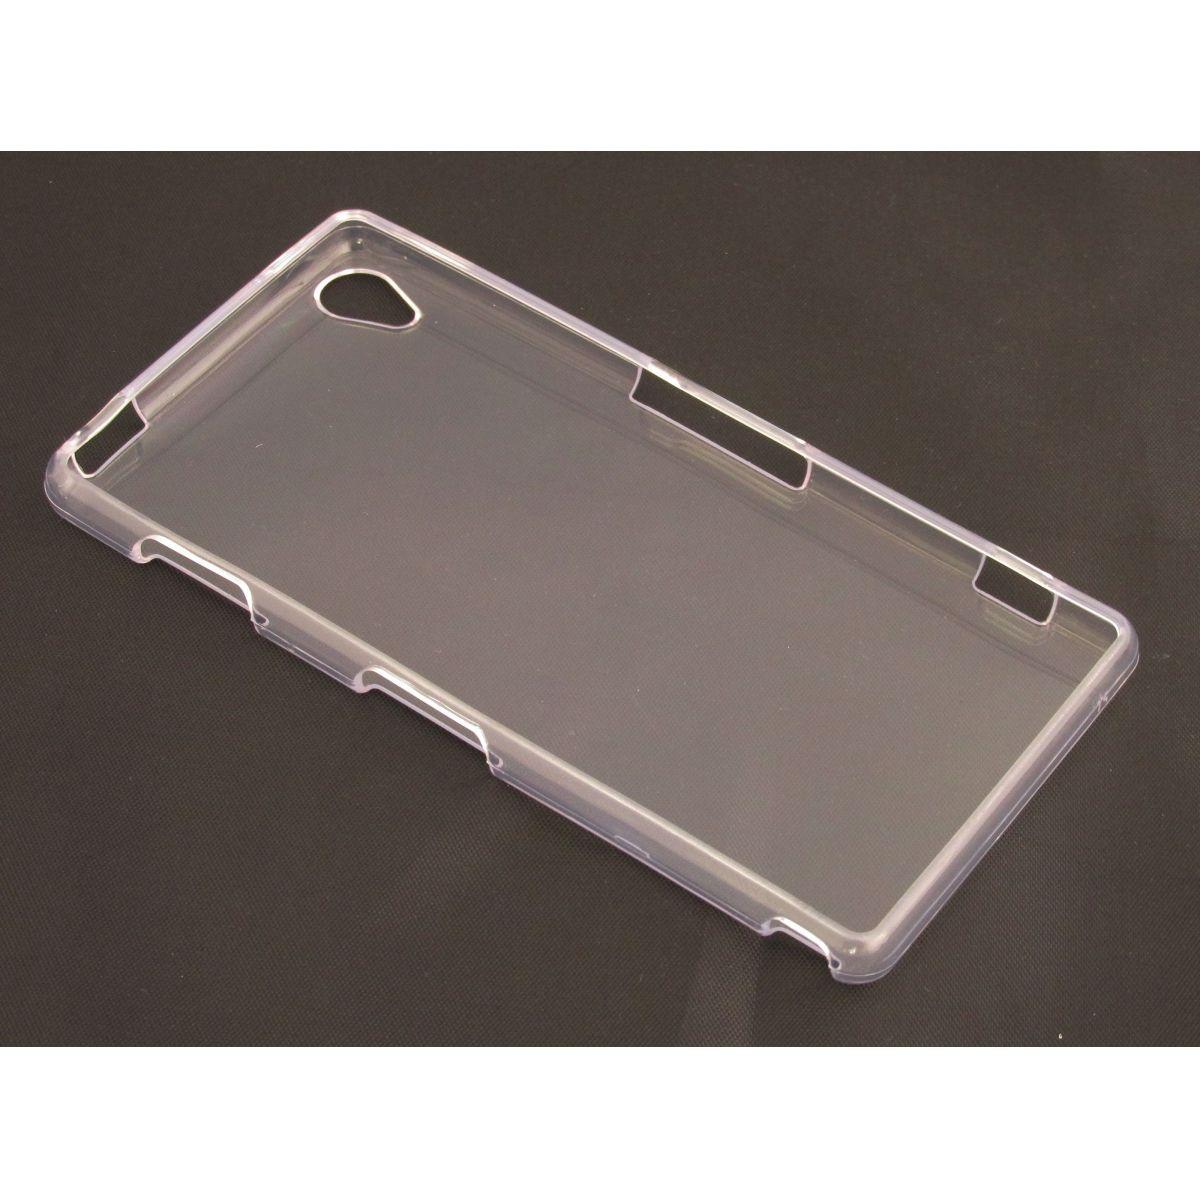 Capa TPU Transparente Sony Xperia Z3 D6603